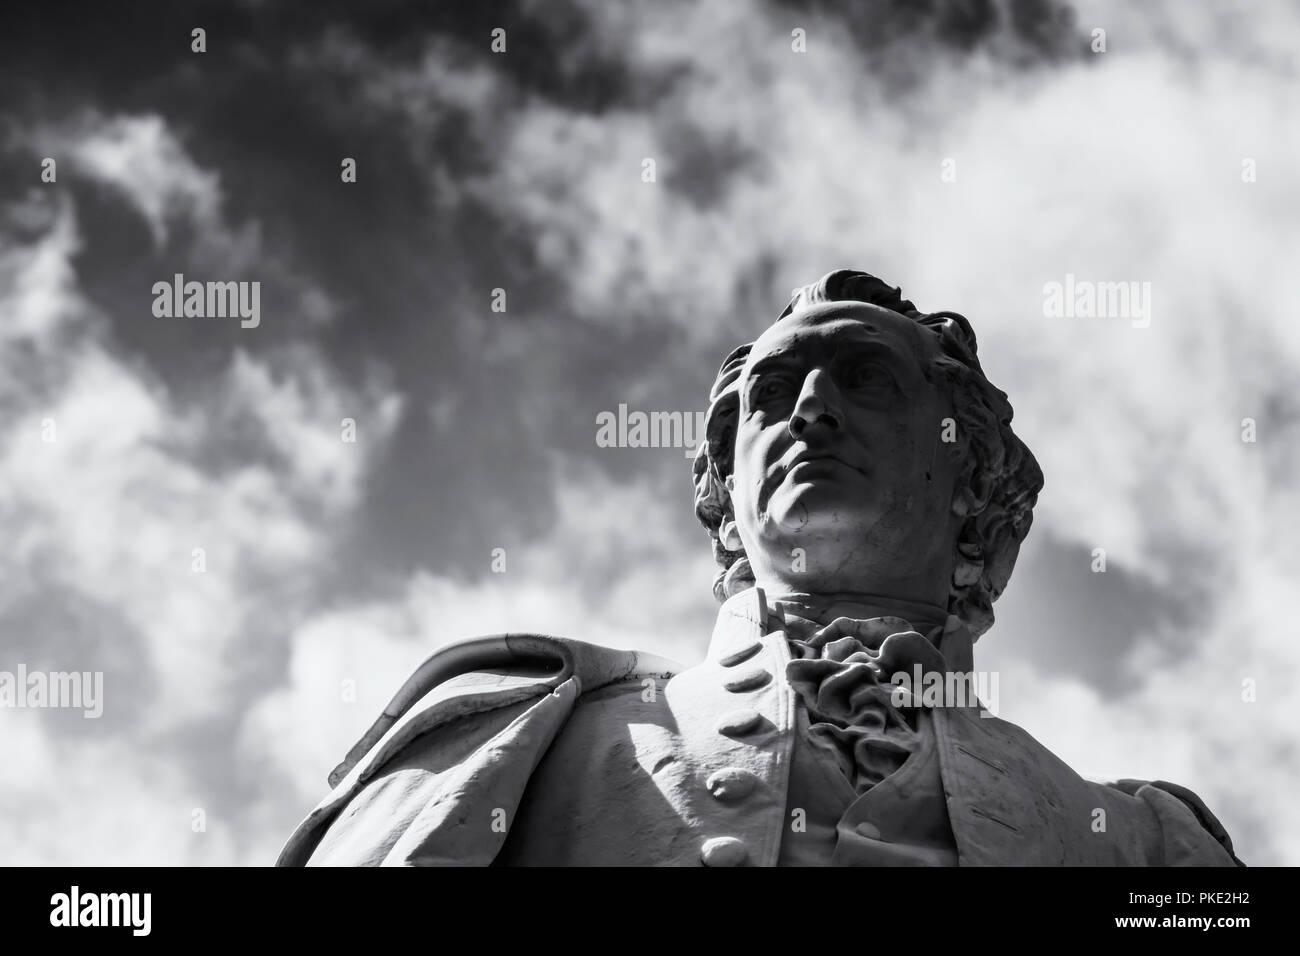 Berlin, Germany, July 24, 2018: Close-Up of Head of German Poet Goethe Statue at Tiergarten Park - Stock Image